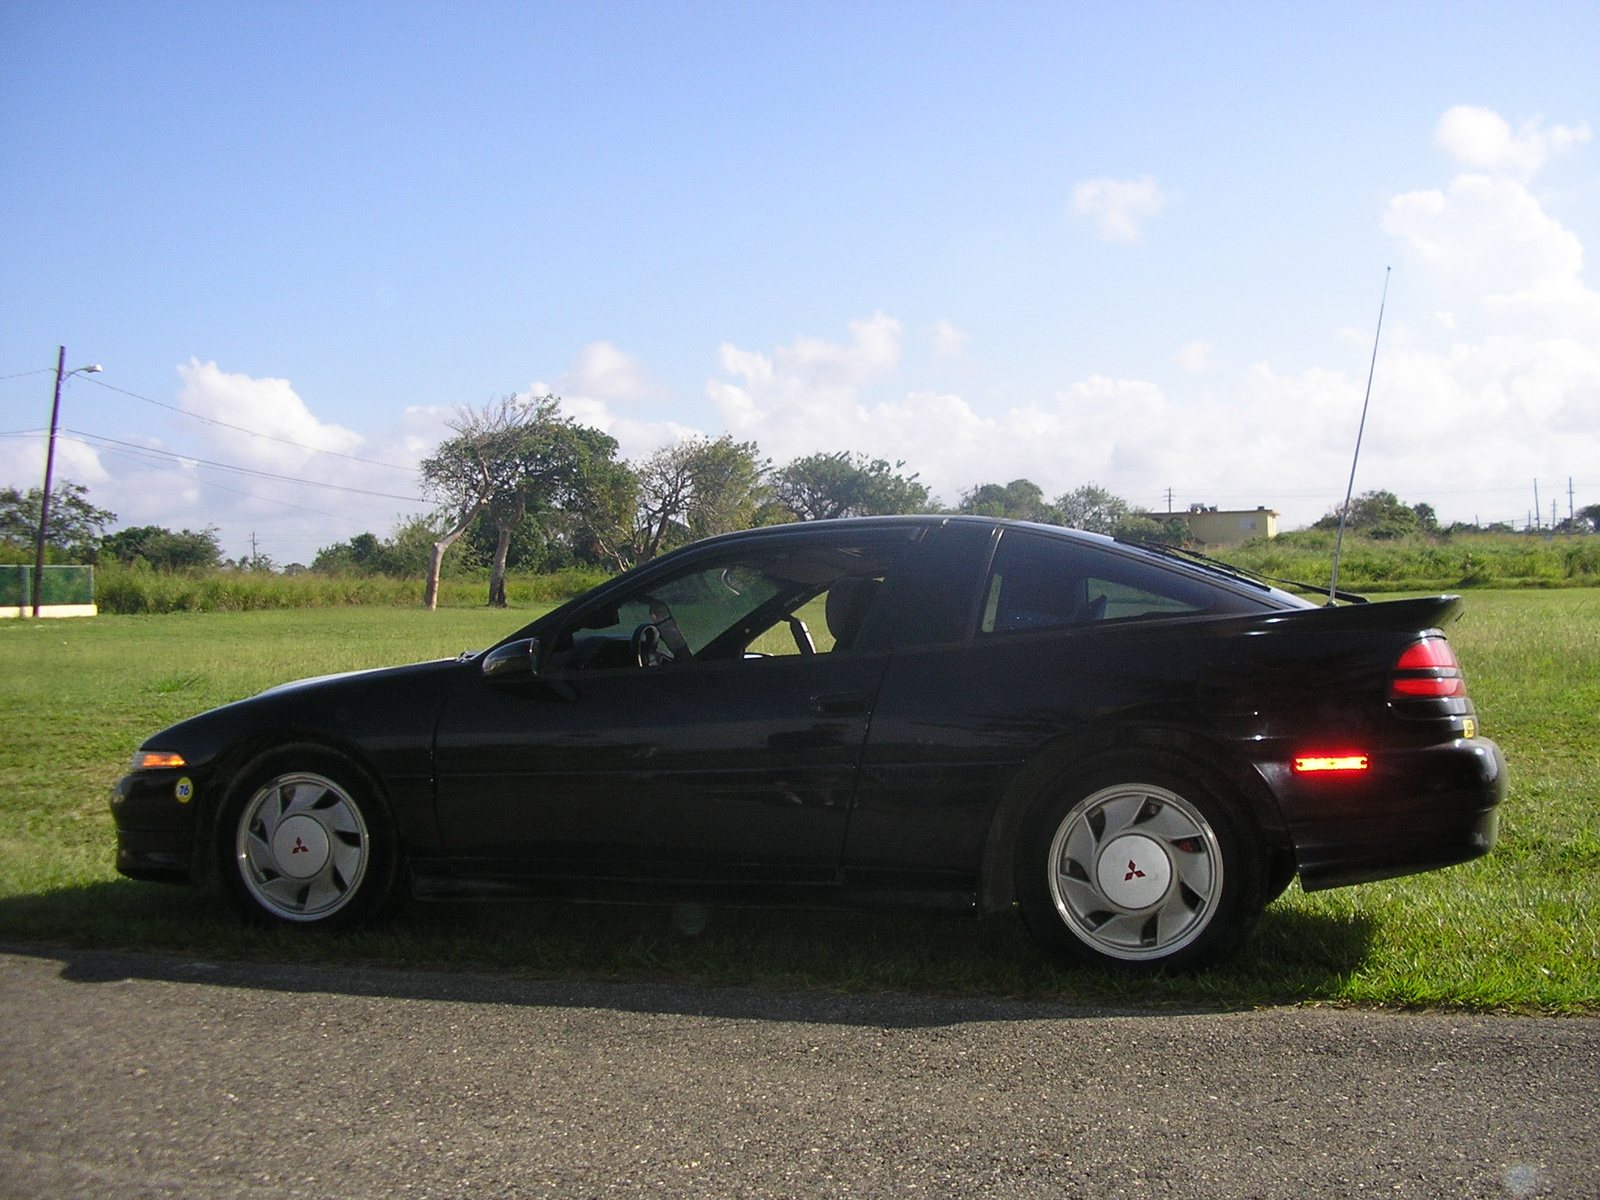 1998 Dr Mitsubishi Turbo Mitsubishi Gst Gst Eclipse 1998 Eclipse 2